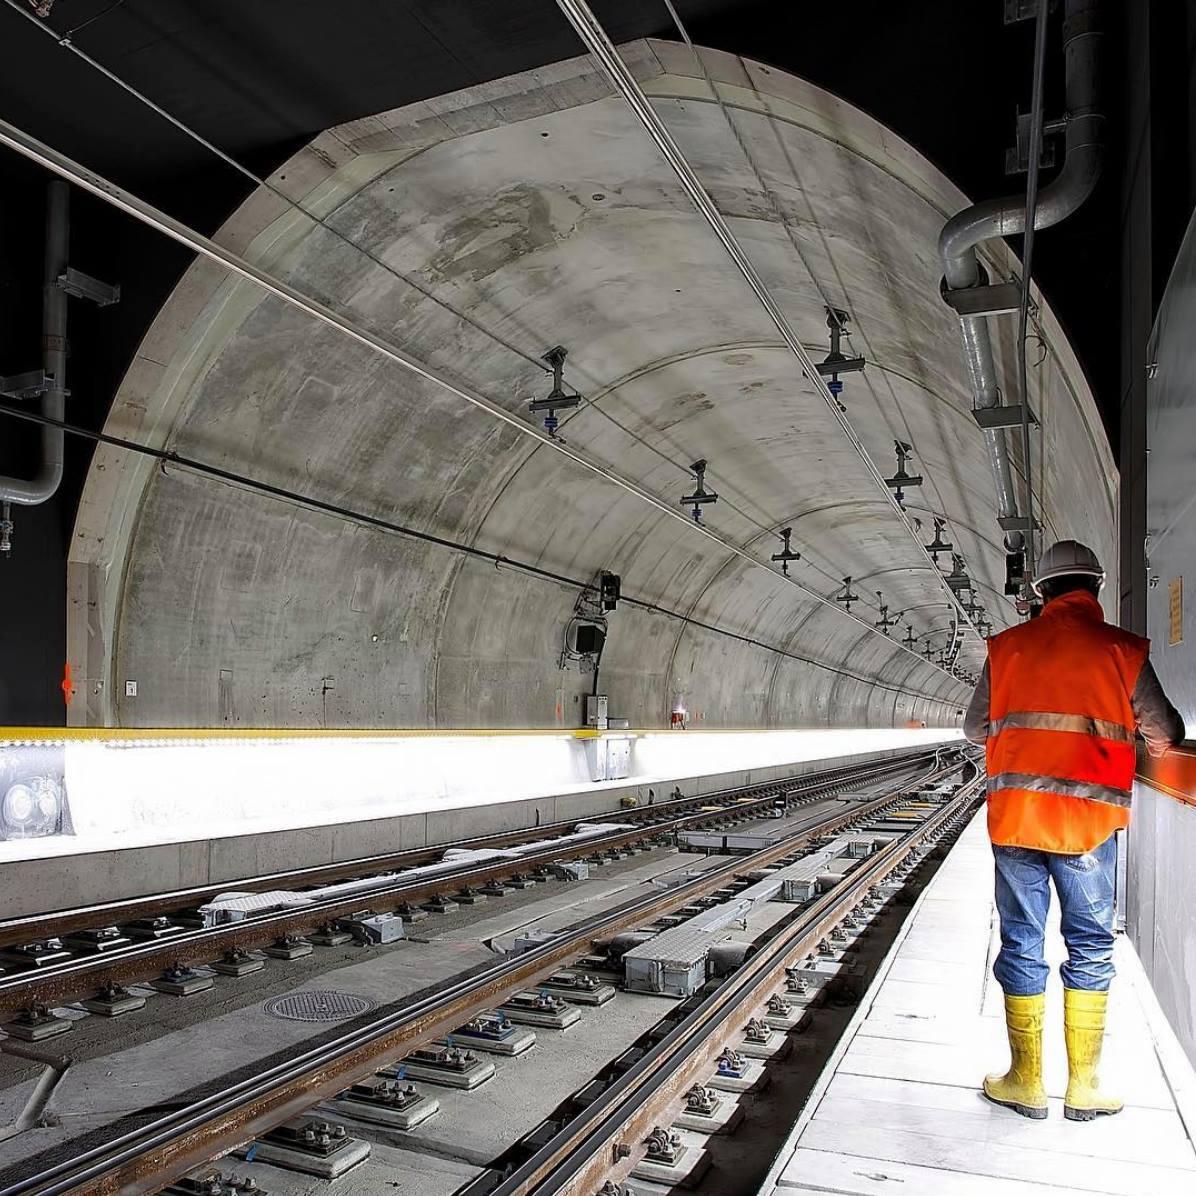 Man in Tunnel Wearing Safety Gear